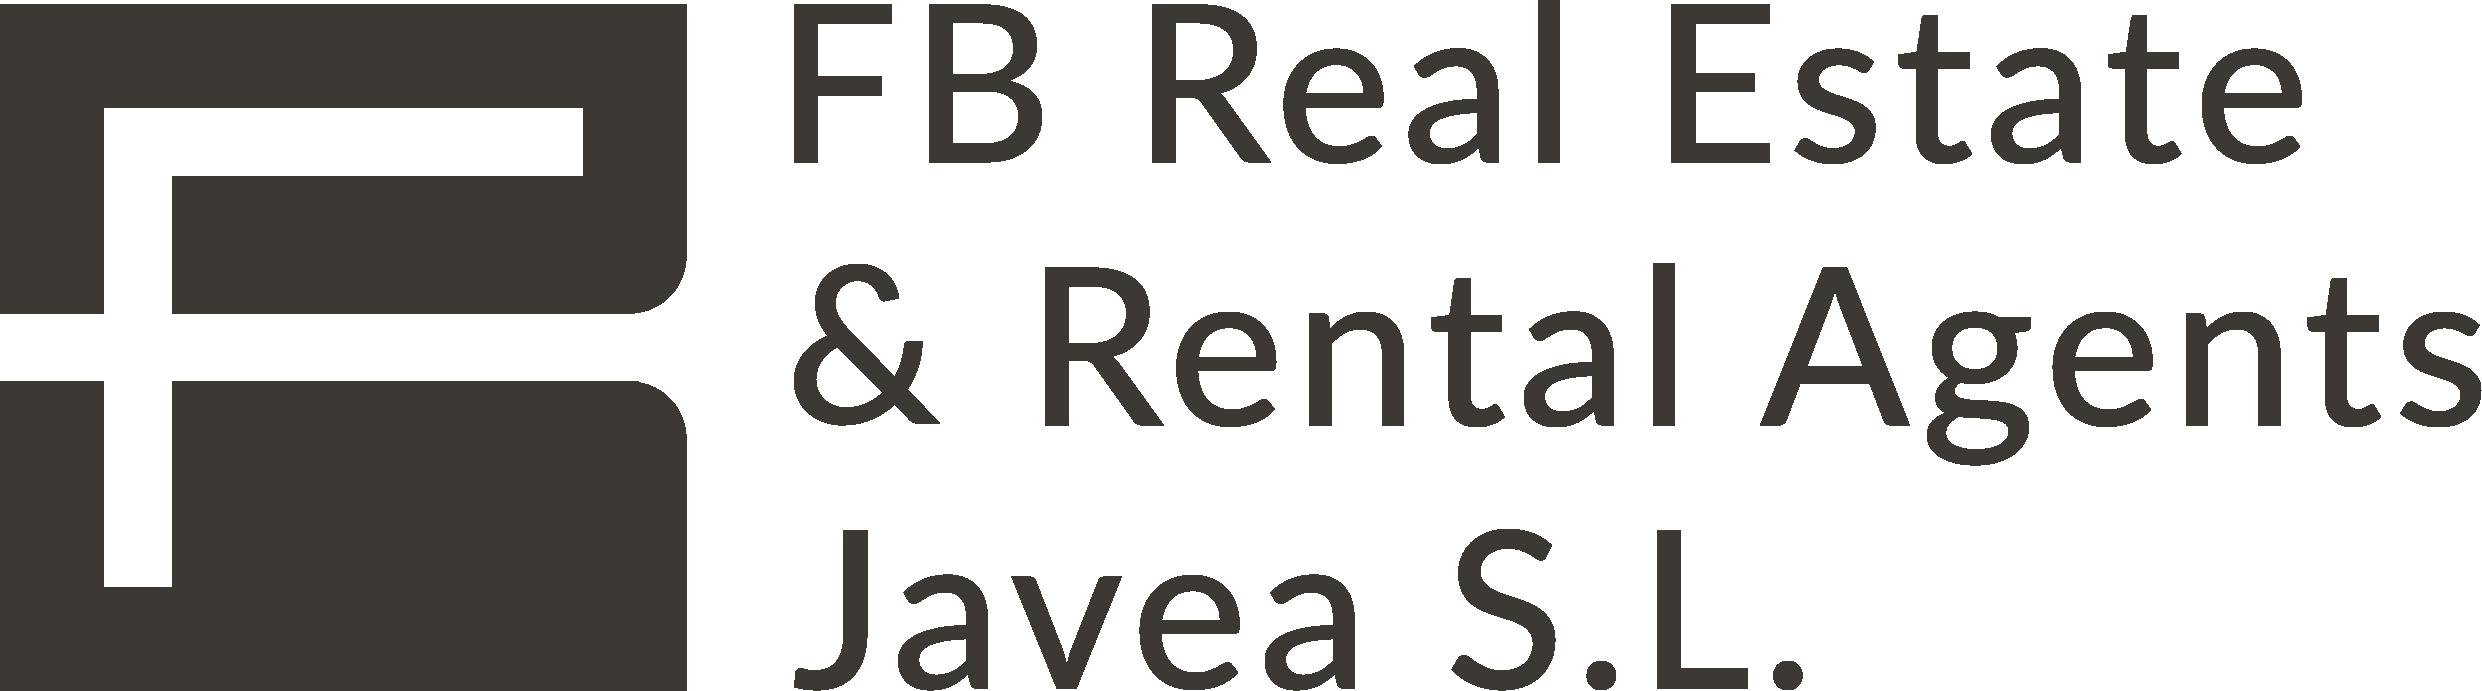 FB Real Estate ES